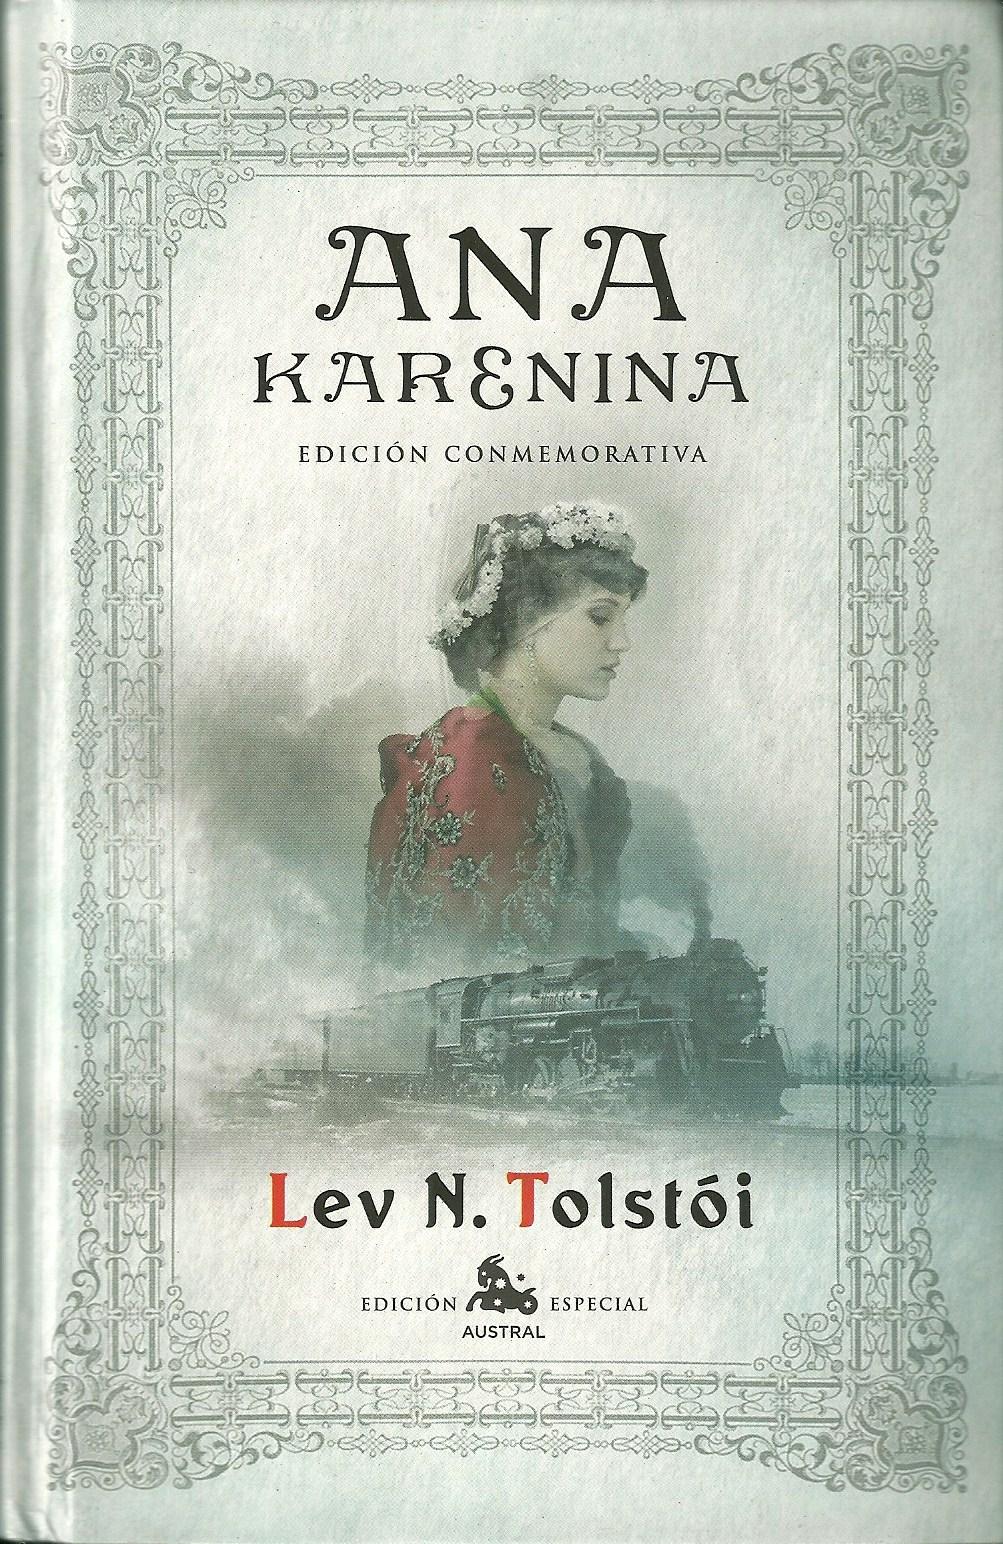 El comienzo de Ana Karenina, de León Tolstoi